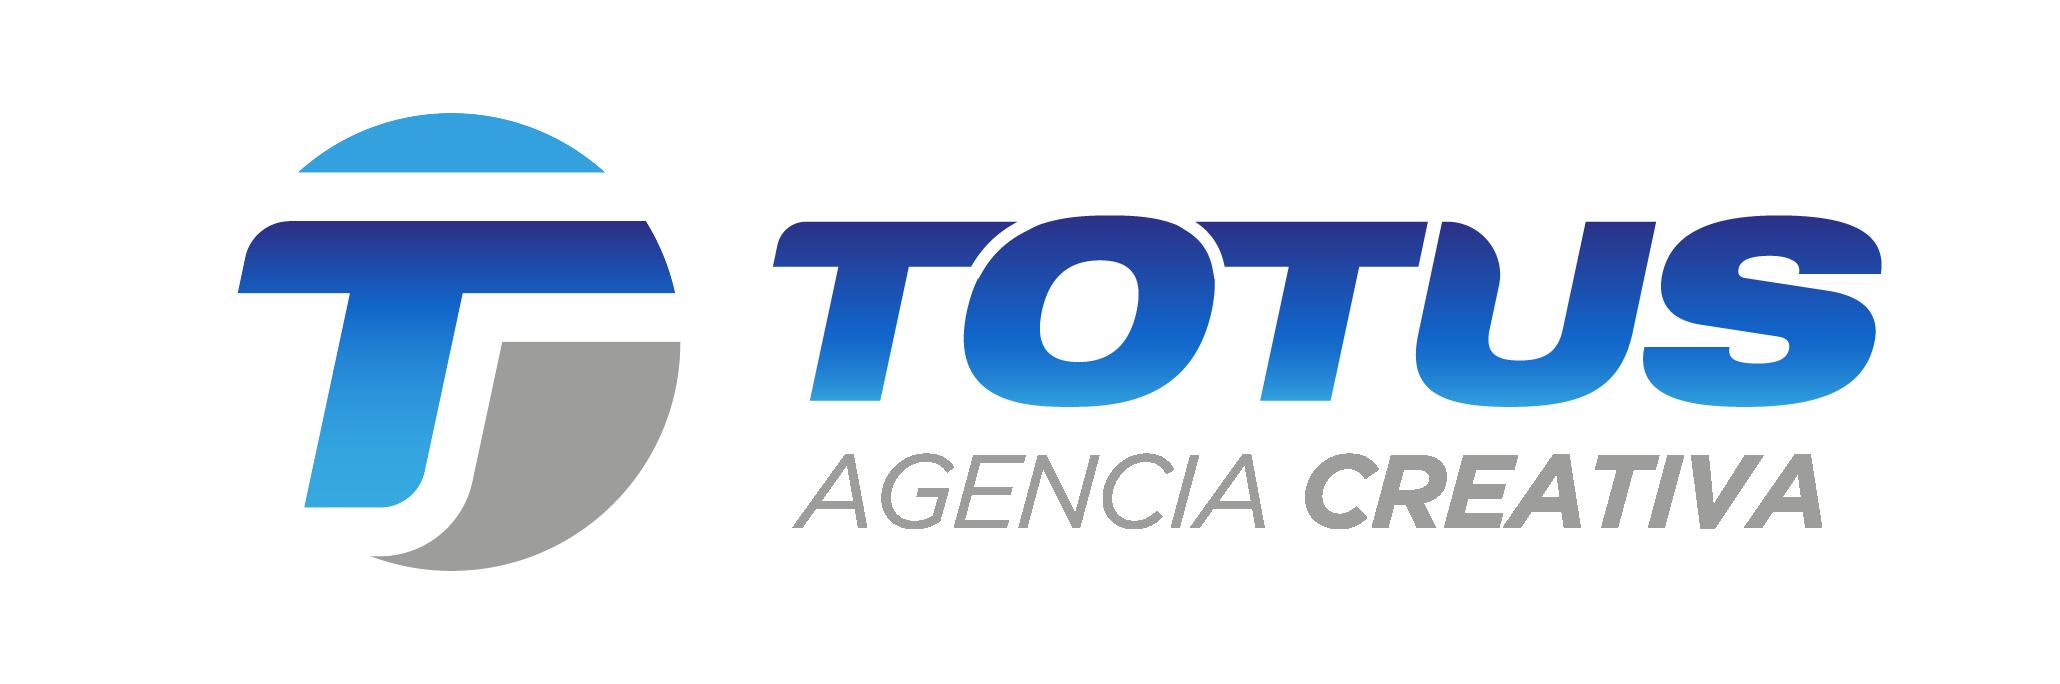 Totus Agencia logo New FINAL_horz